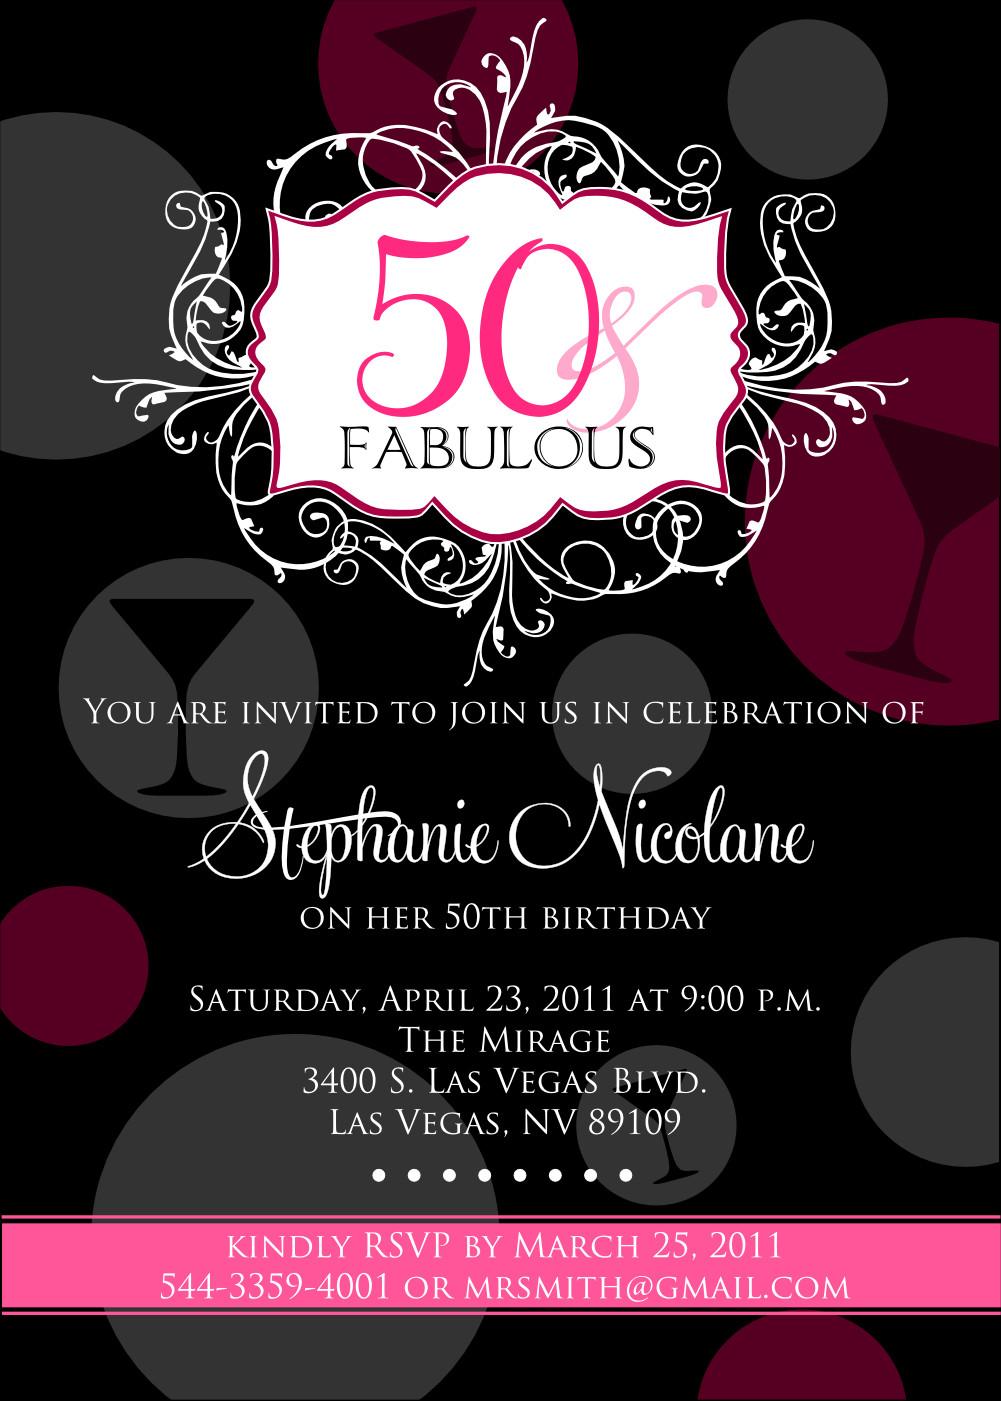 50th Birthday Invitation Template 50th Birthday Beach Party Invitations